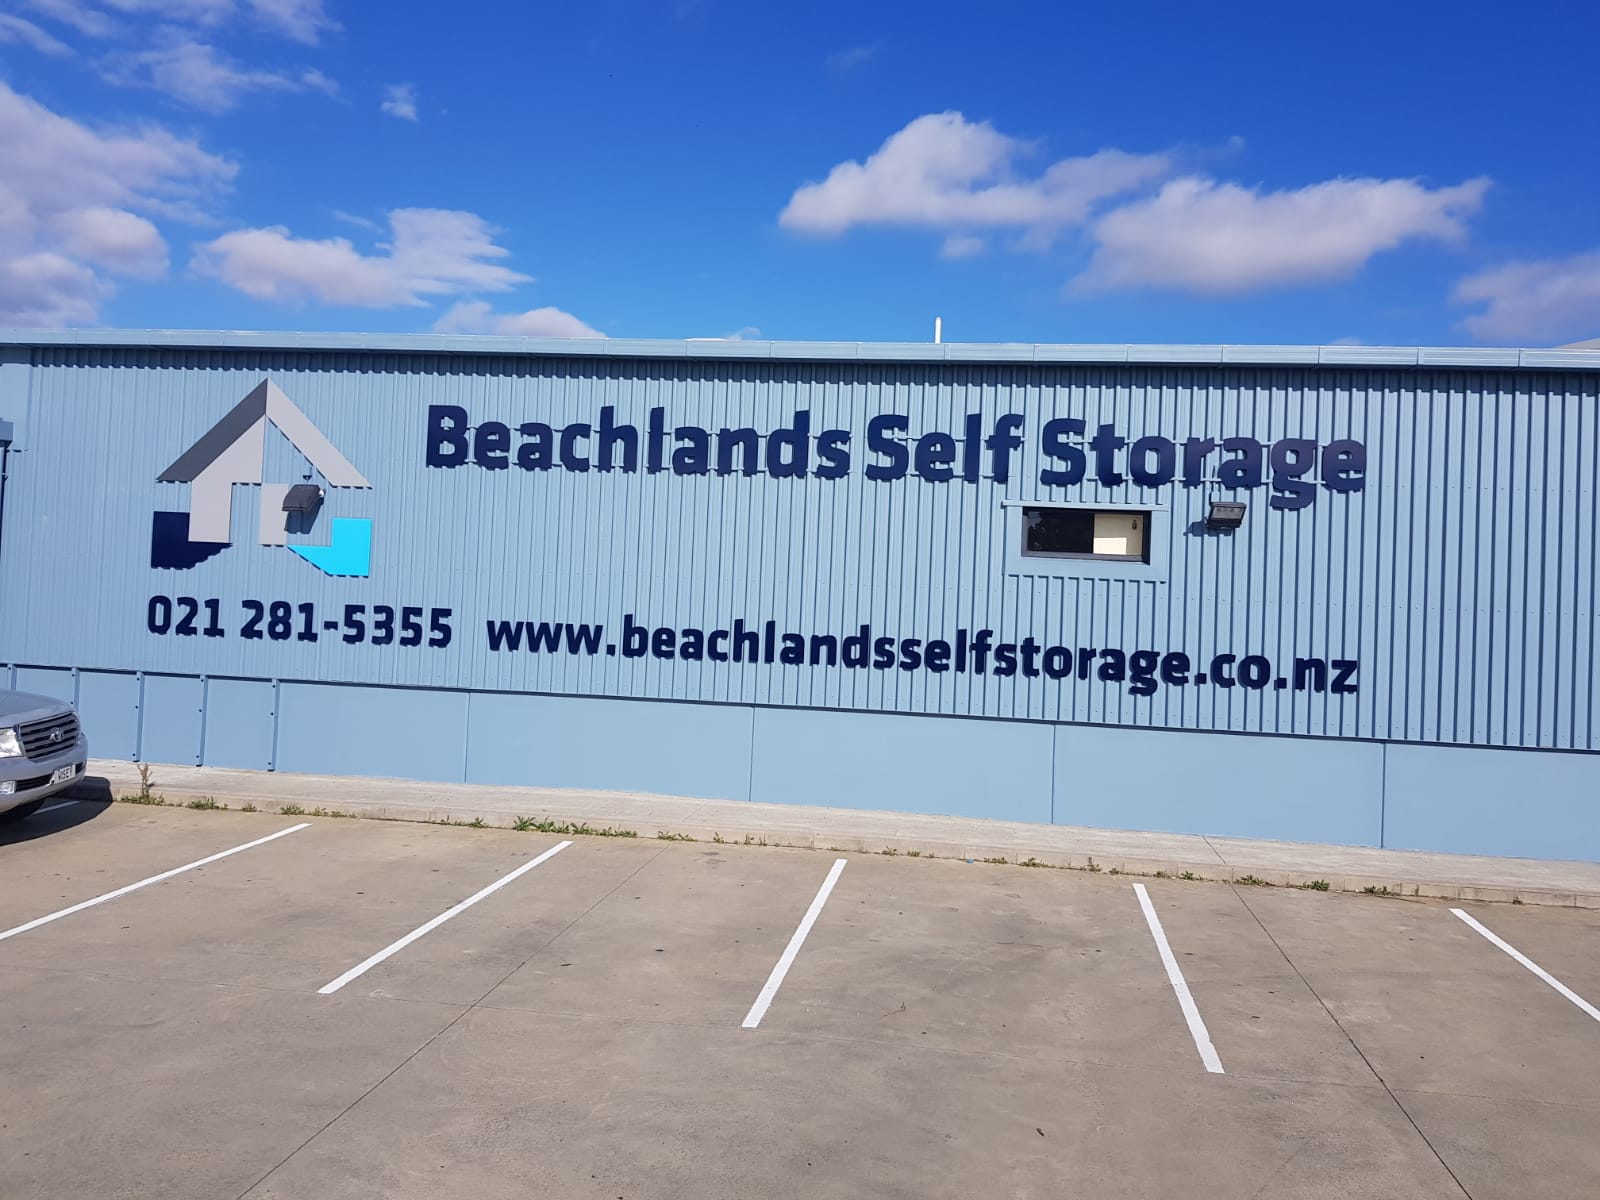 Beachlands Self Storage